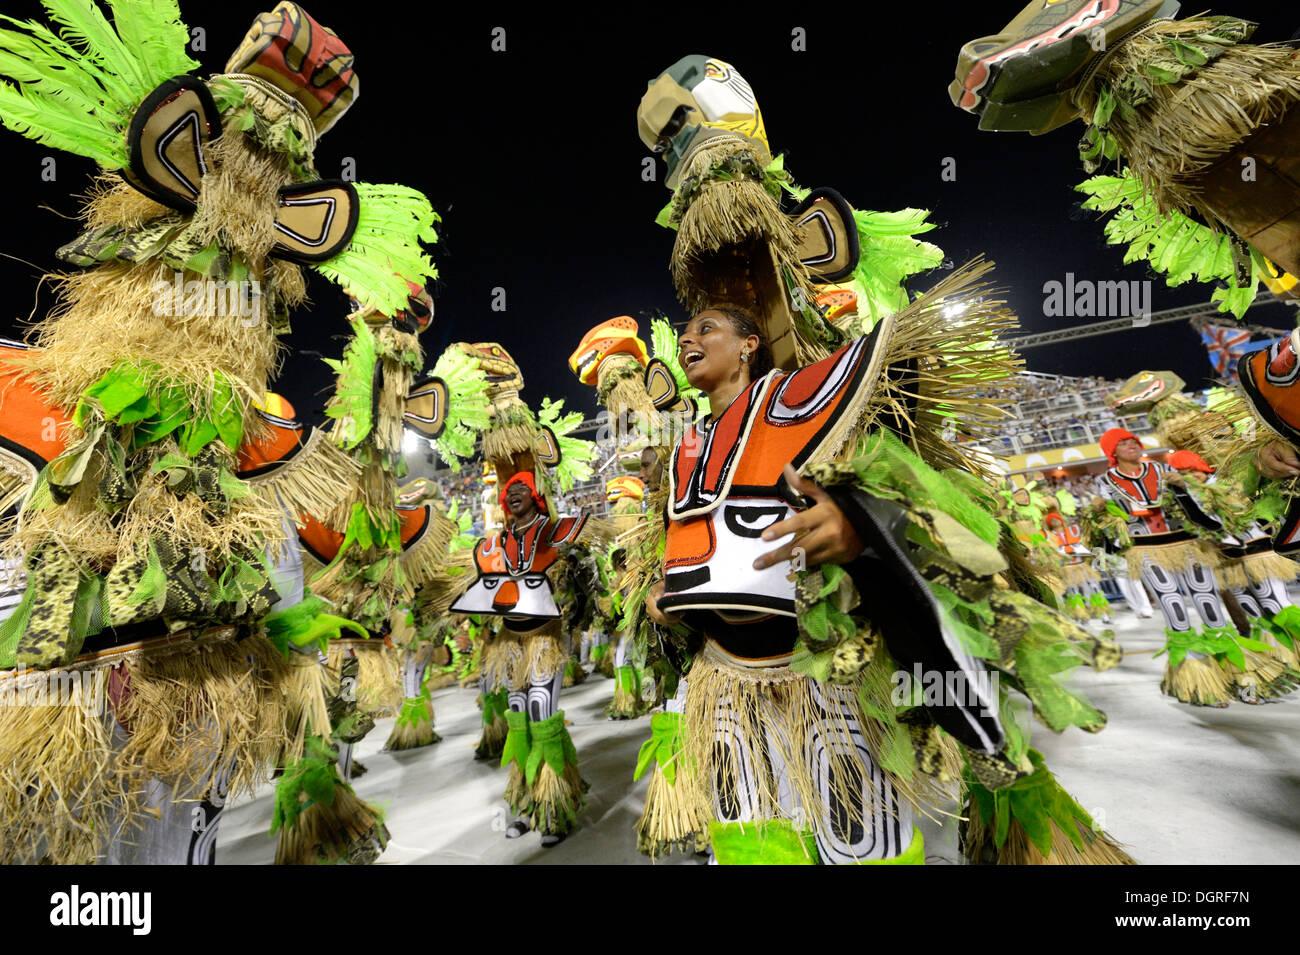 Brasil, Rio de Janeiro, Carnival, Samba schools performing in costumes - Stock Image